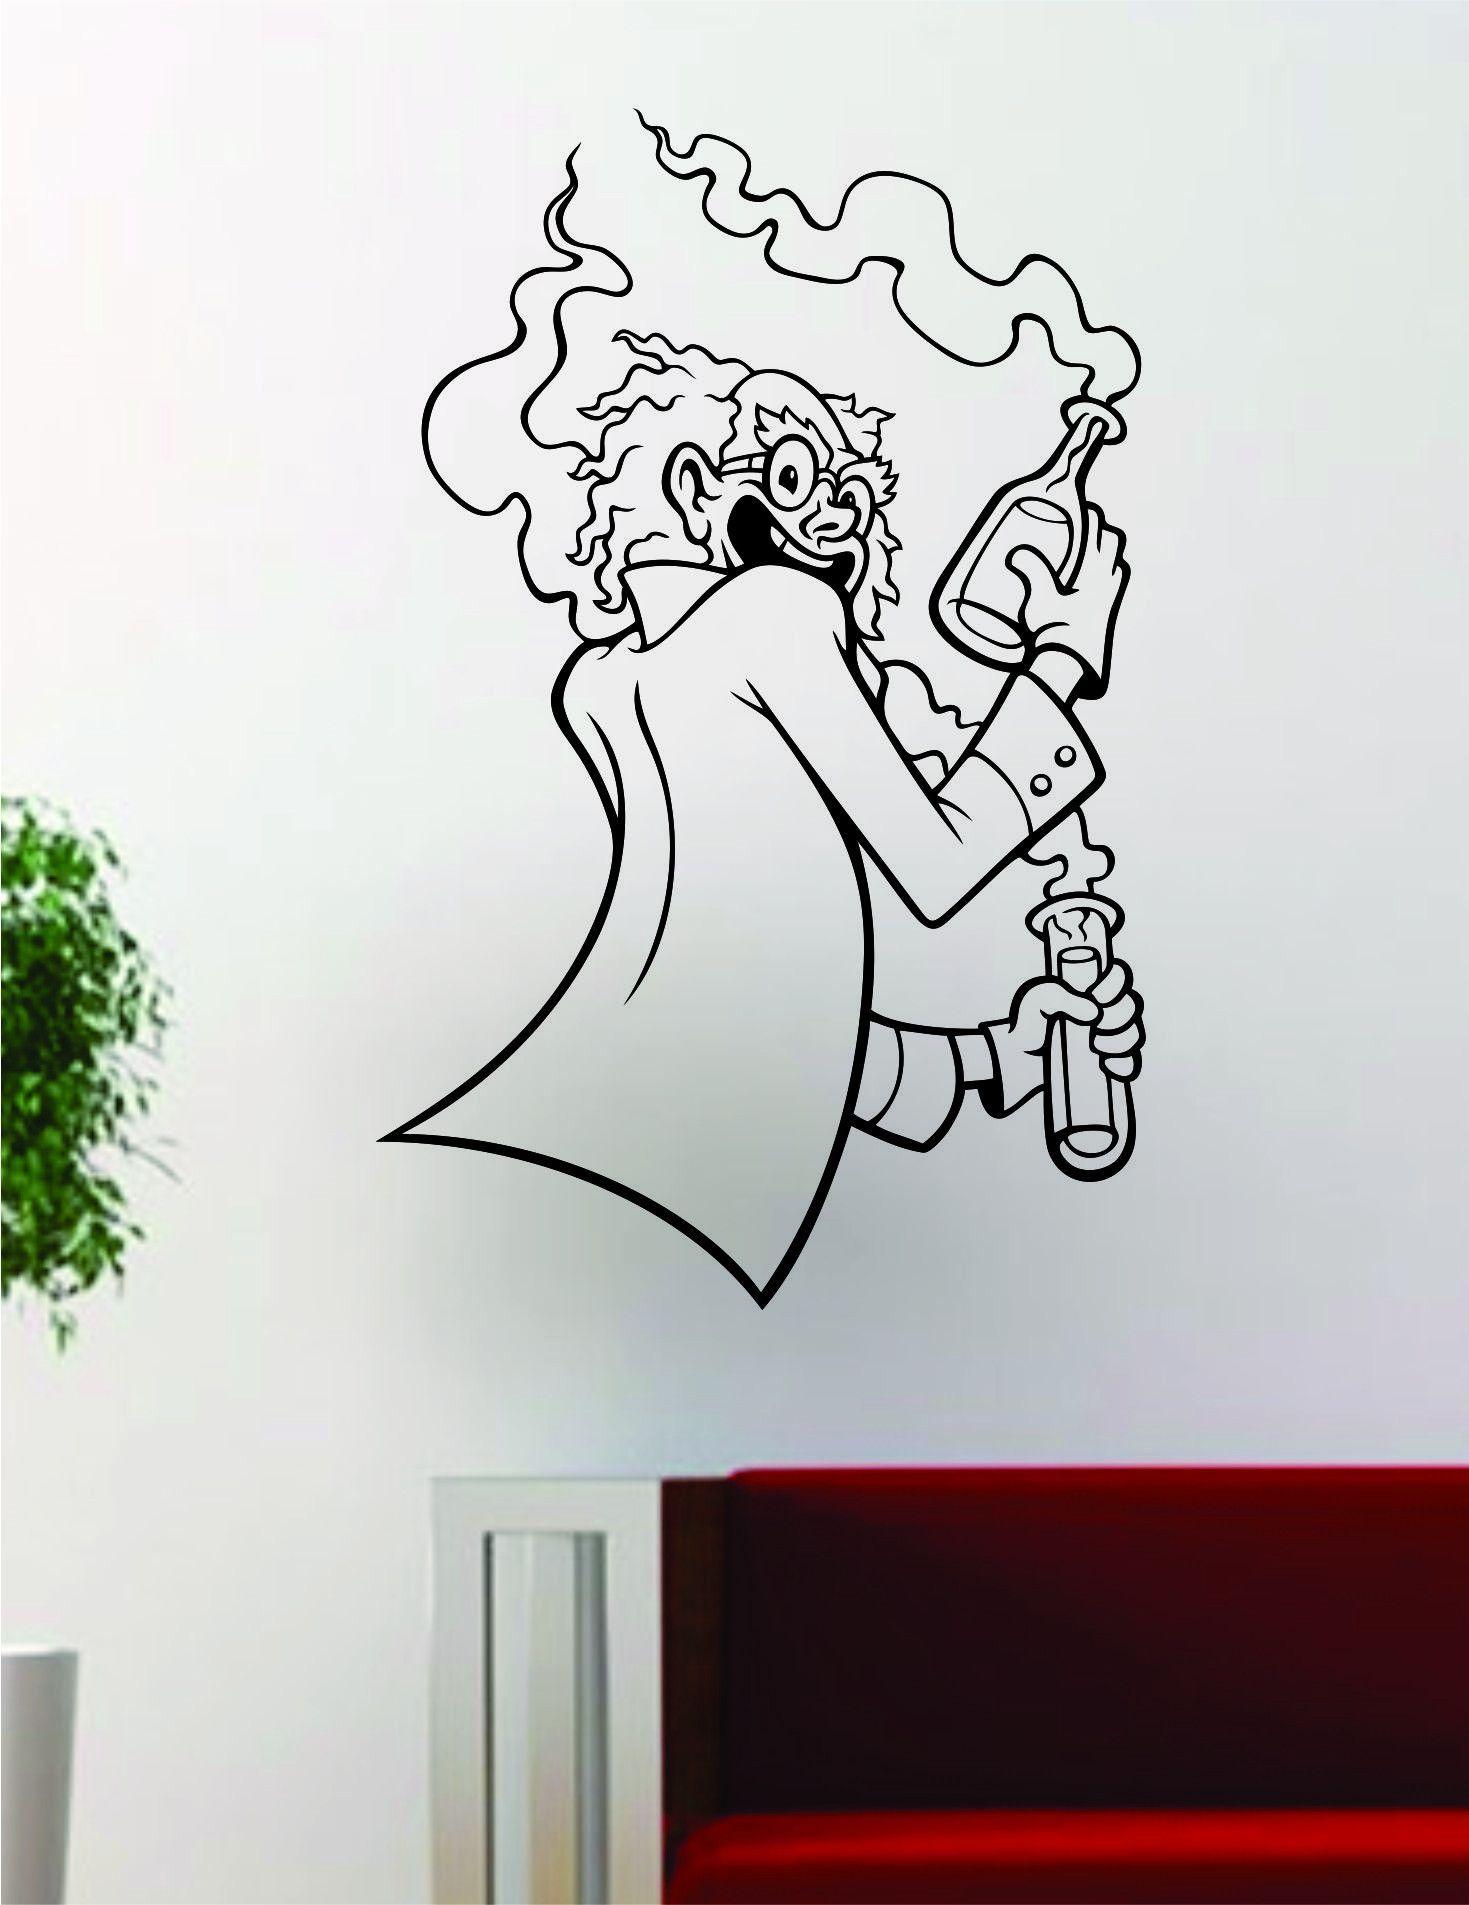 Mad Scientist Design Art Science School Decal Sticker Wall Vinyl Decor